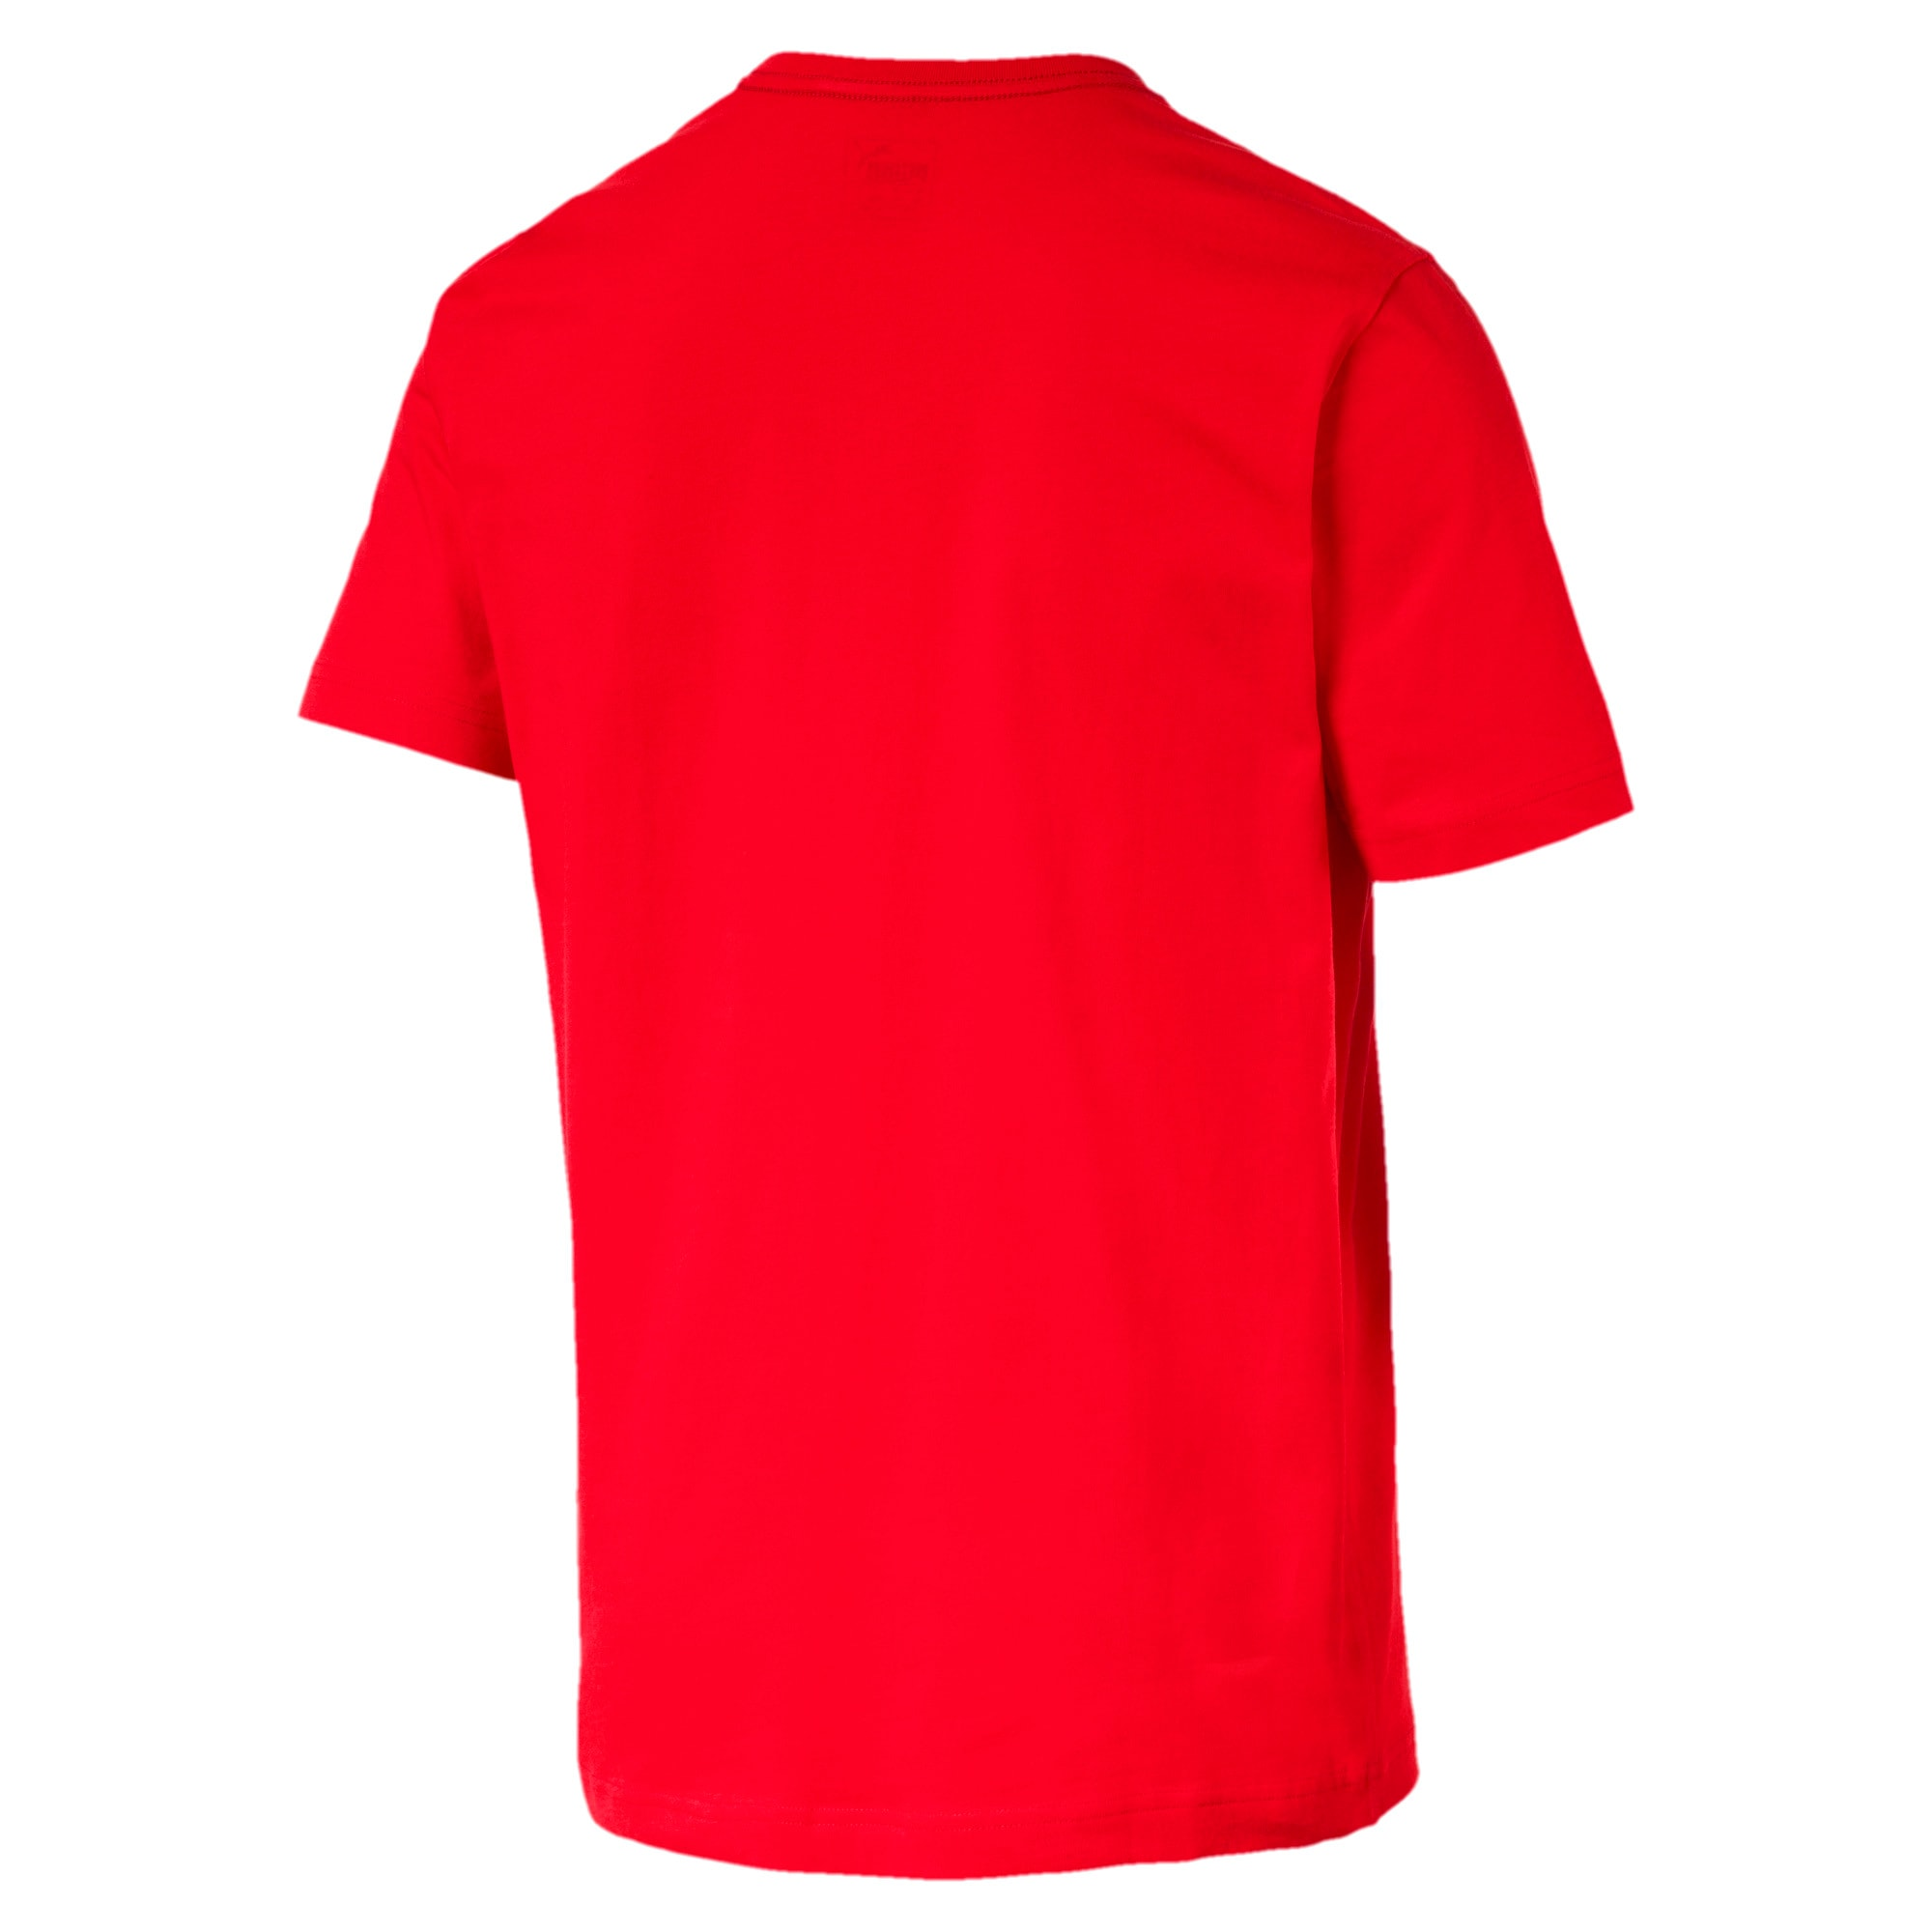 Thumbnail 5 of T-shirt a maniche corte Essentials uomo, Puma Red, medium